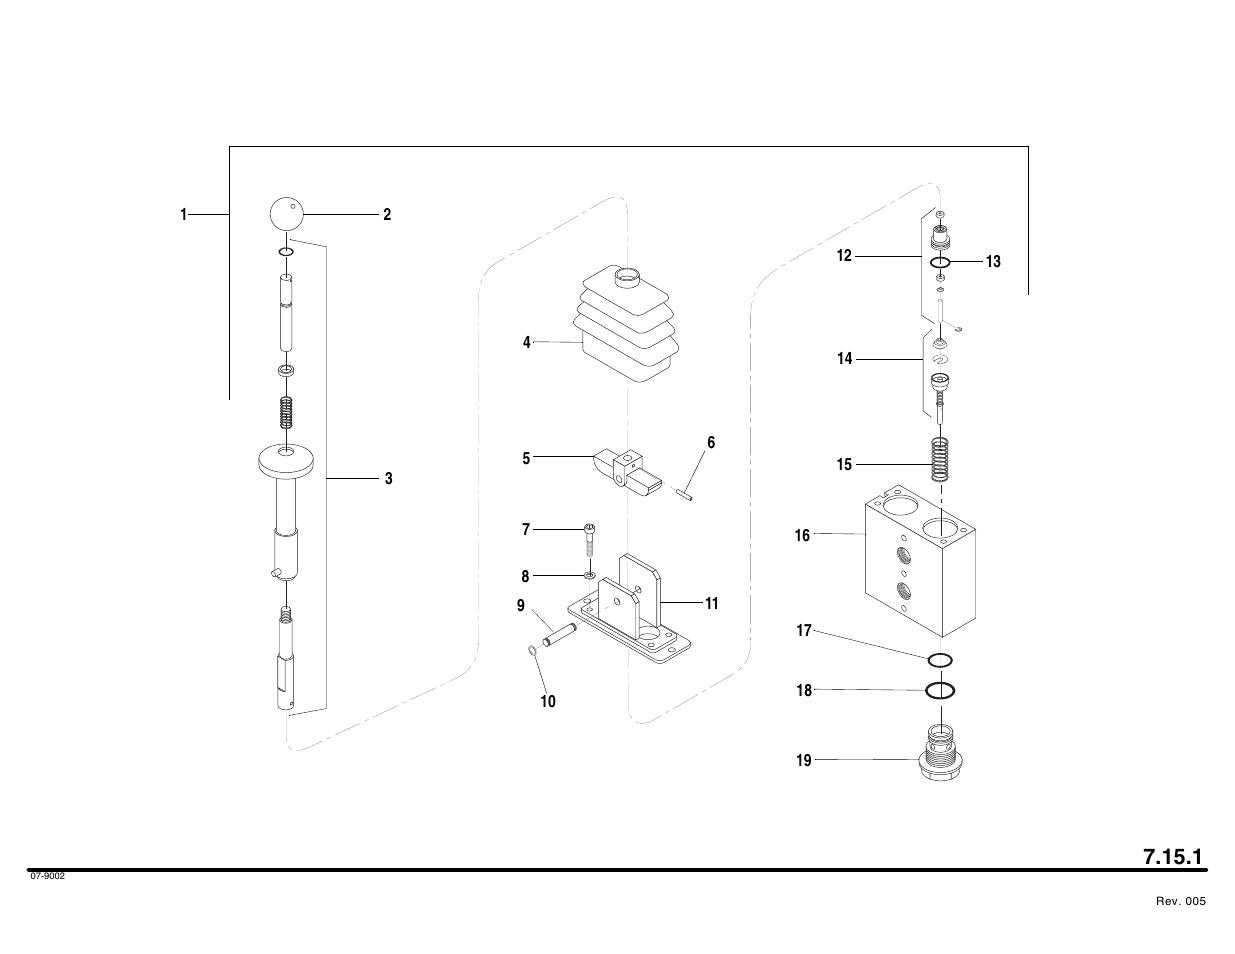 Lull 644b 42 Wiring Diagram Electrical Parts Manual U2022